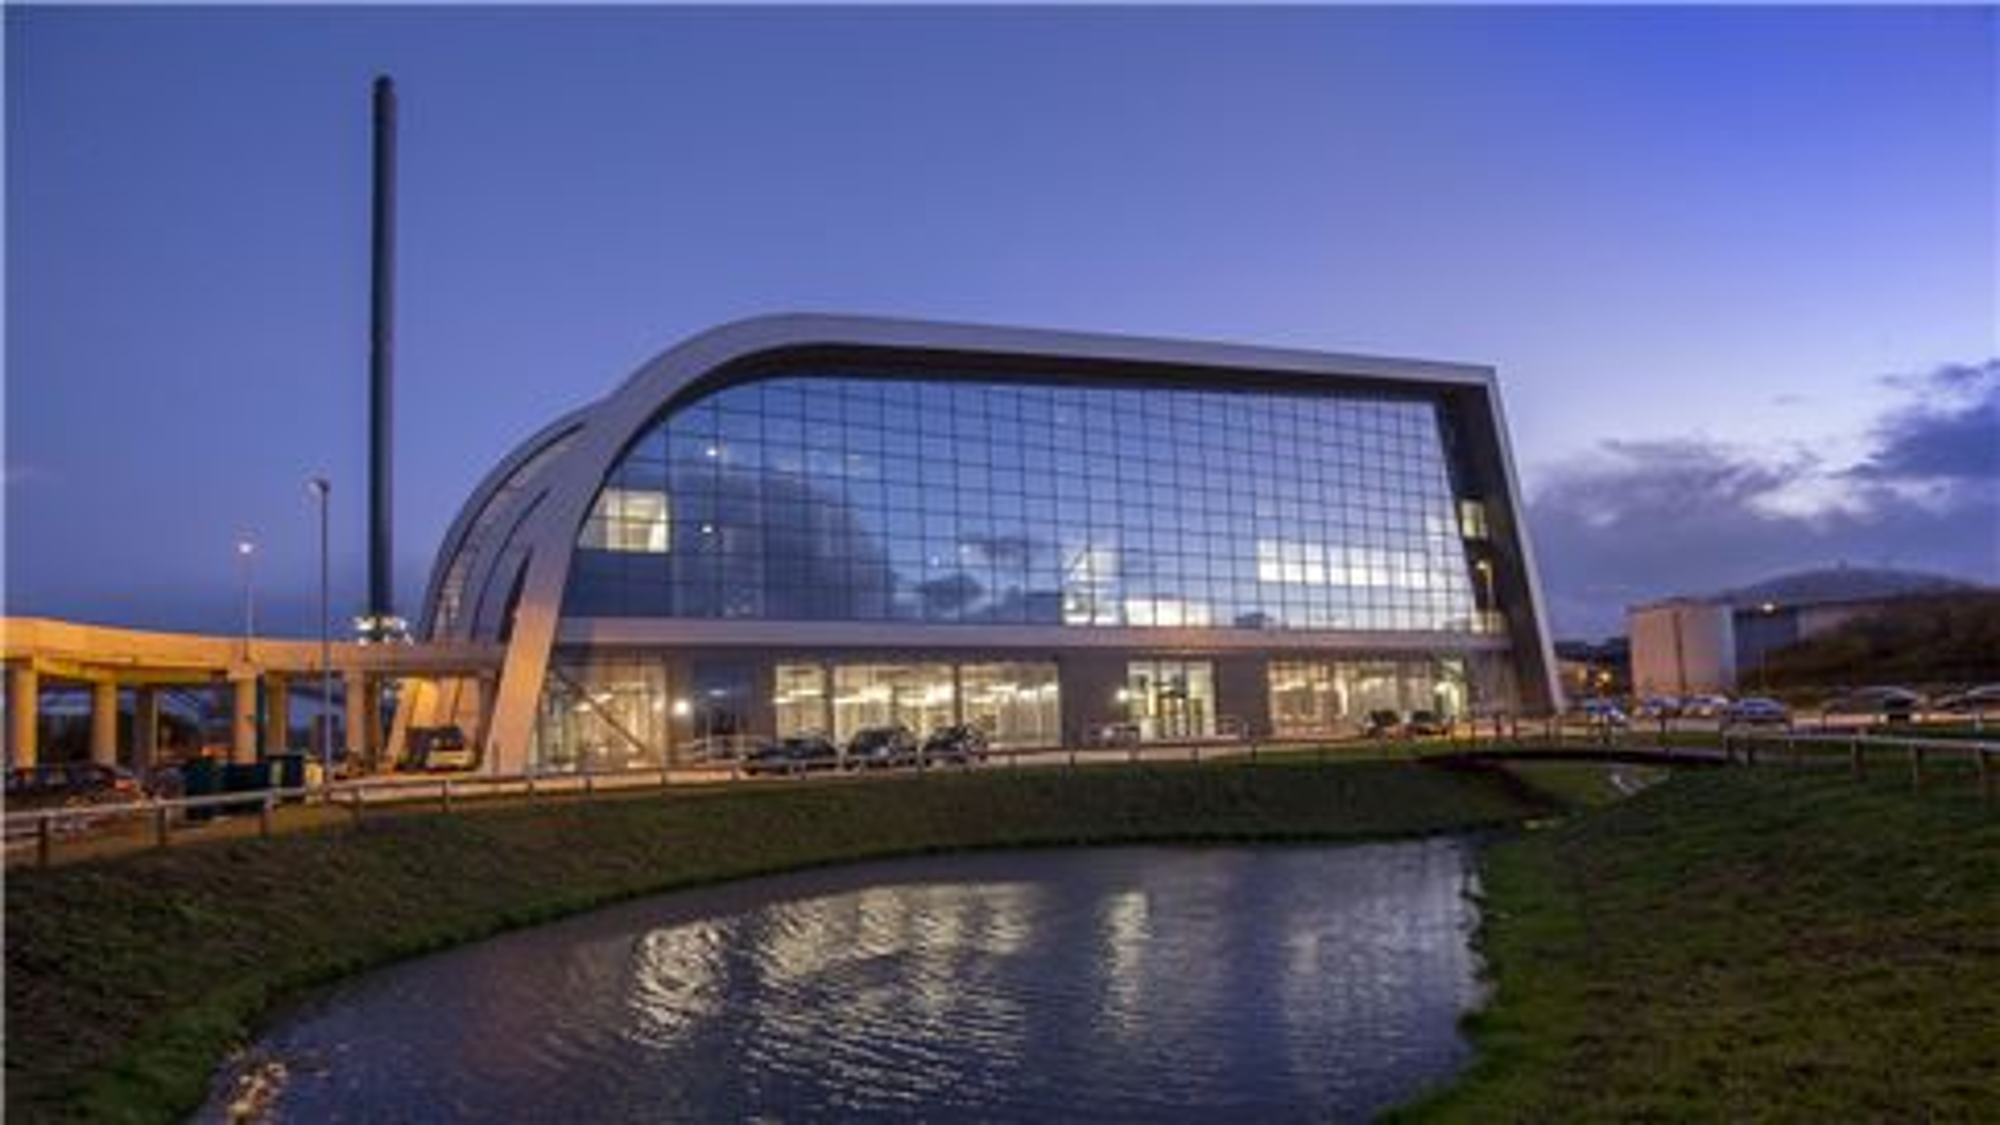 Severnside energy recovery centre